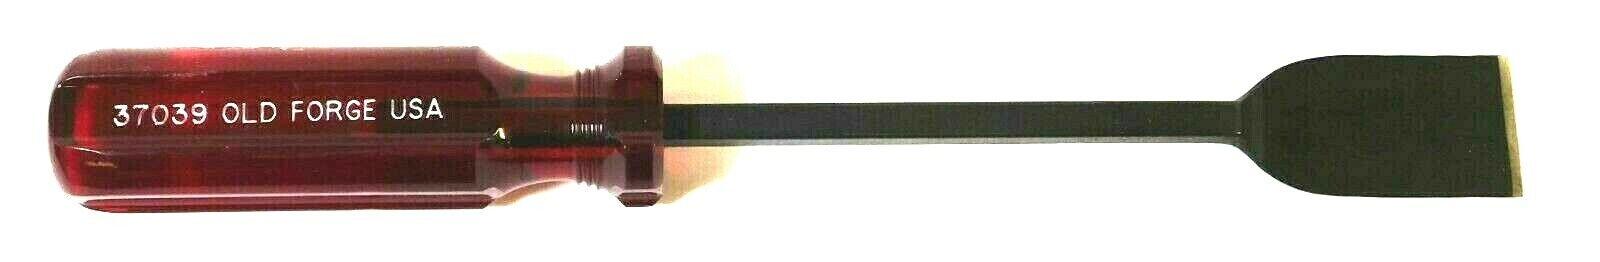 Mayhew Pro 37039 Carbon Scraper